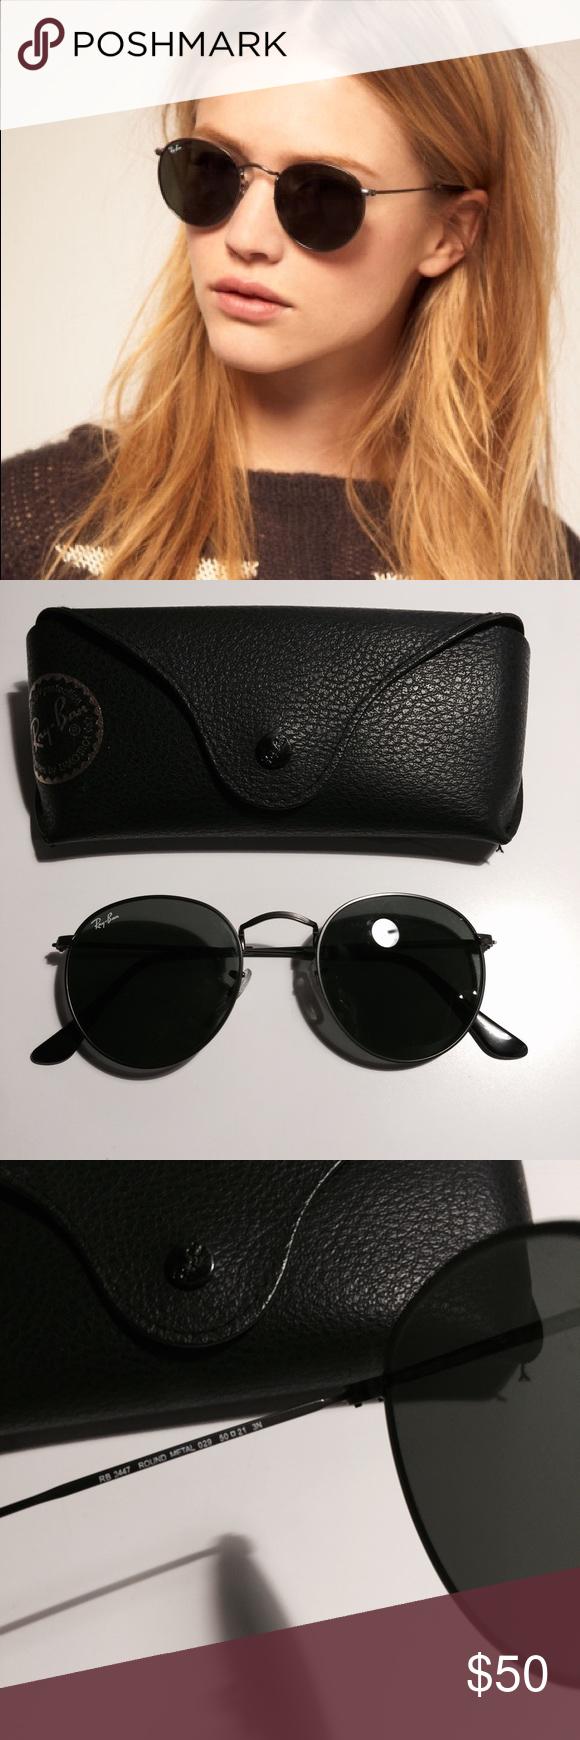 Ray ban black round metal sunglasses 3447 ray ban round metal unisex sunglasses 3447 perfect condition ray ban accessories sunglasses